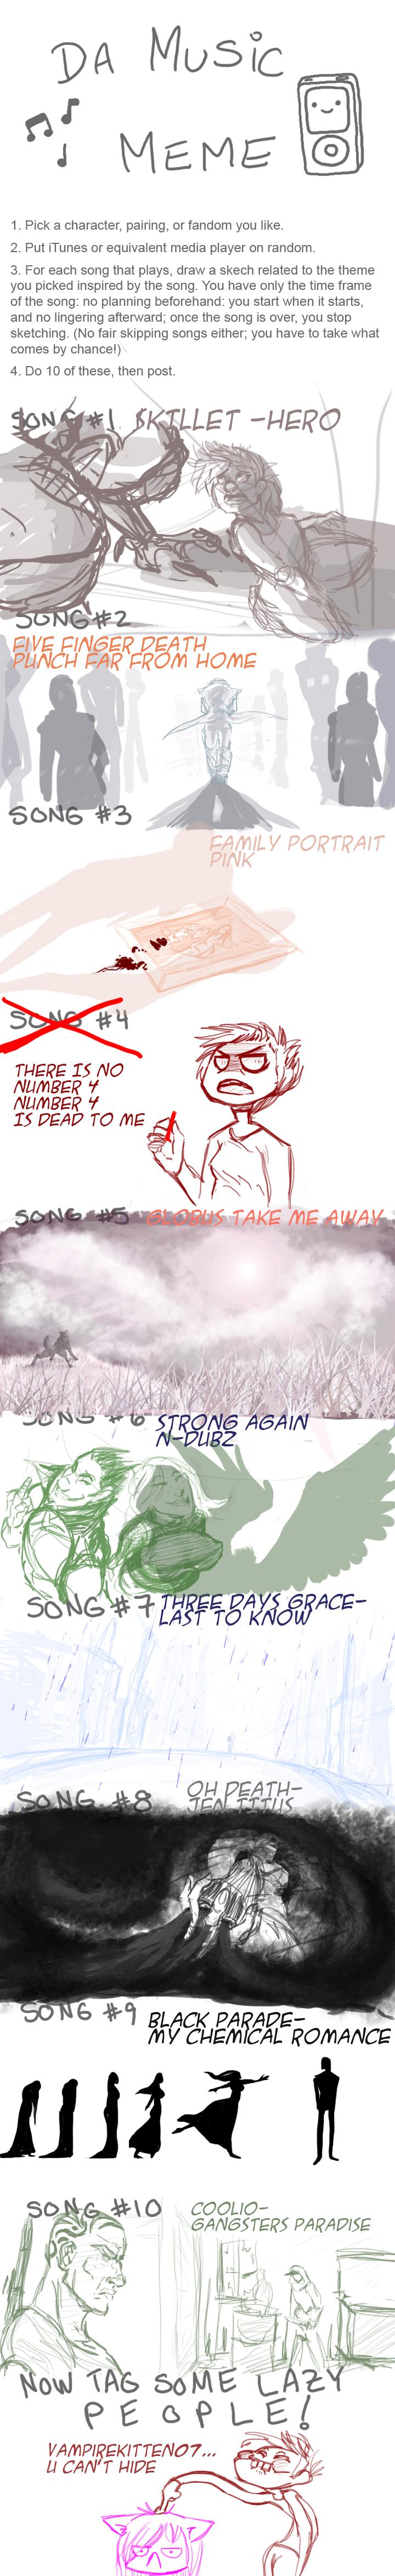 Music Meme by Donlvir